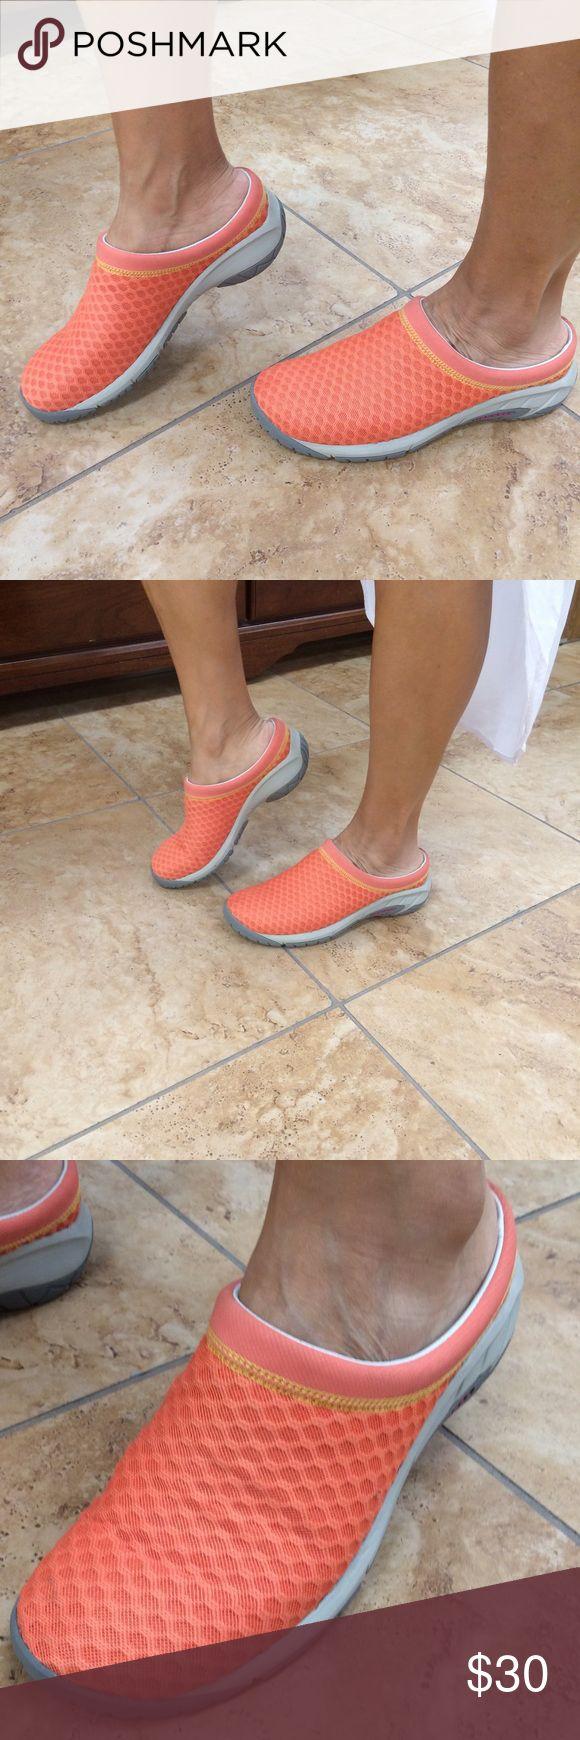 Merrill slip ons Great orange or melon color Merrill slip ons. Size 8. Merrill Shoes Mules & Clogs